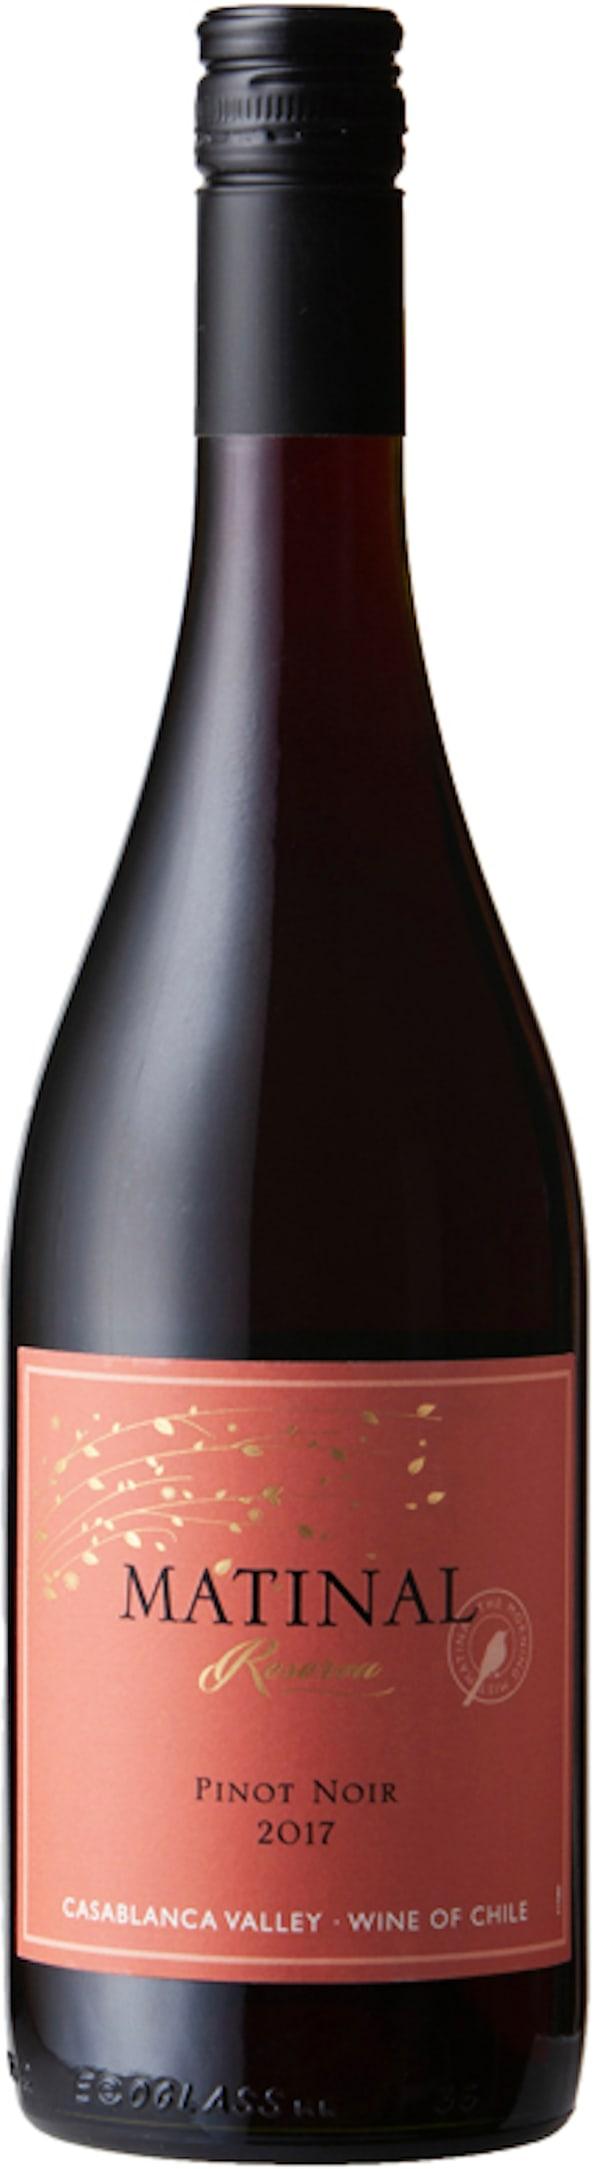 Fray Leon Reserve Pinot Noir 2017